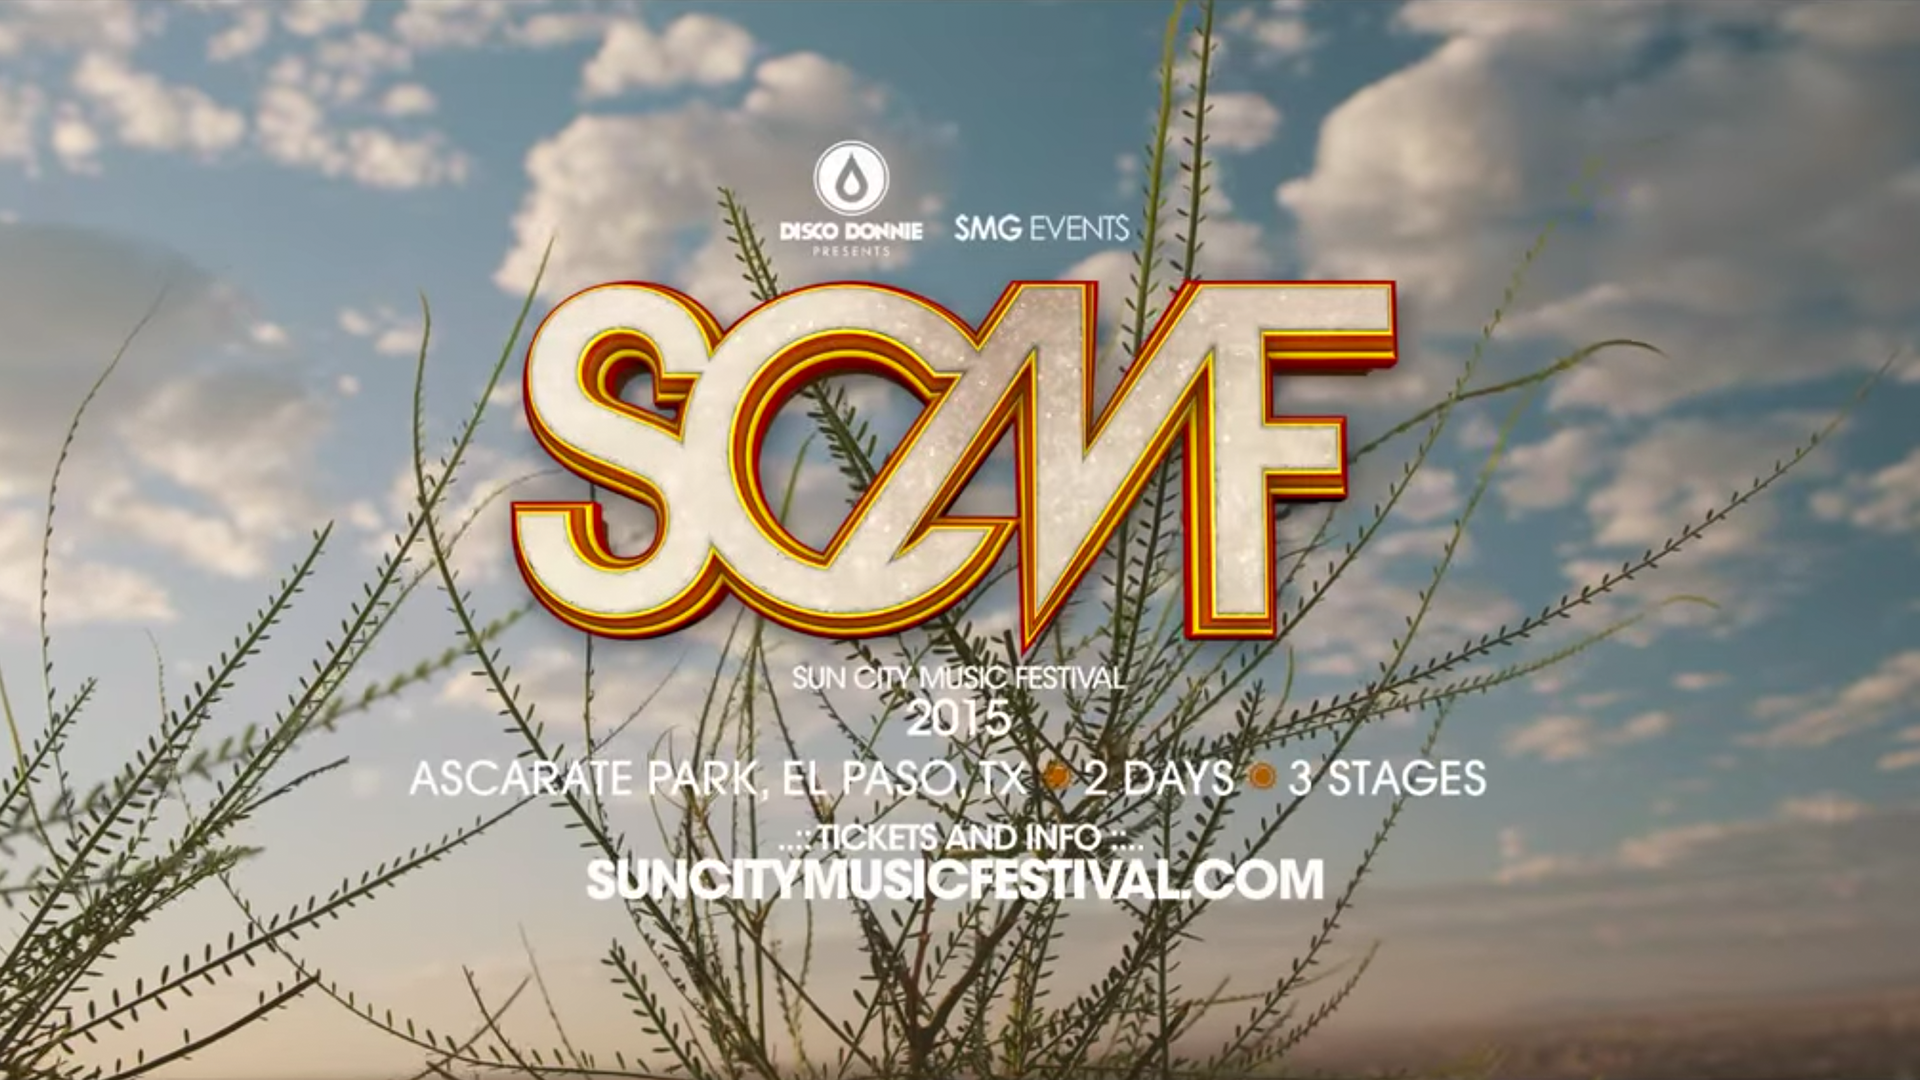 Sun City Music Festival2015 Trailer